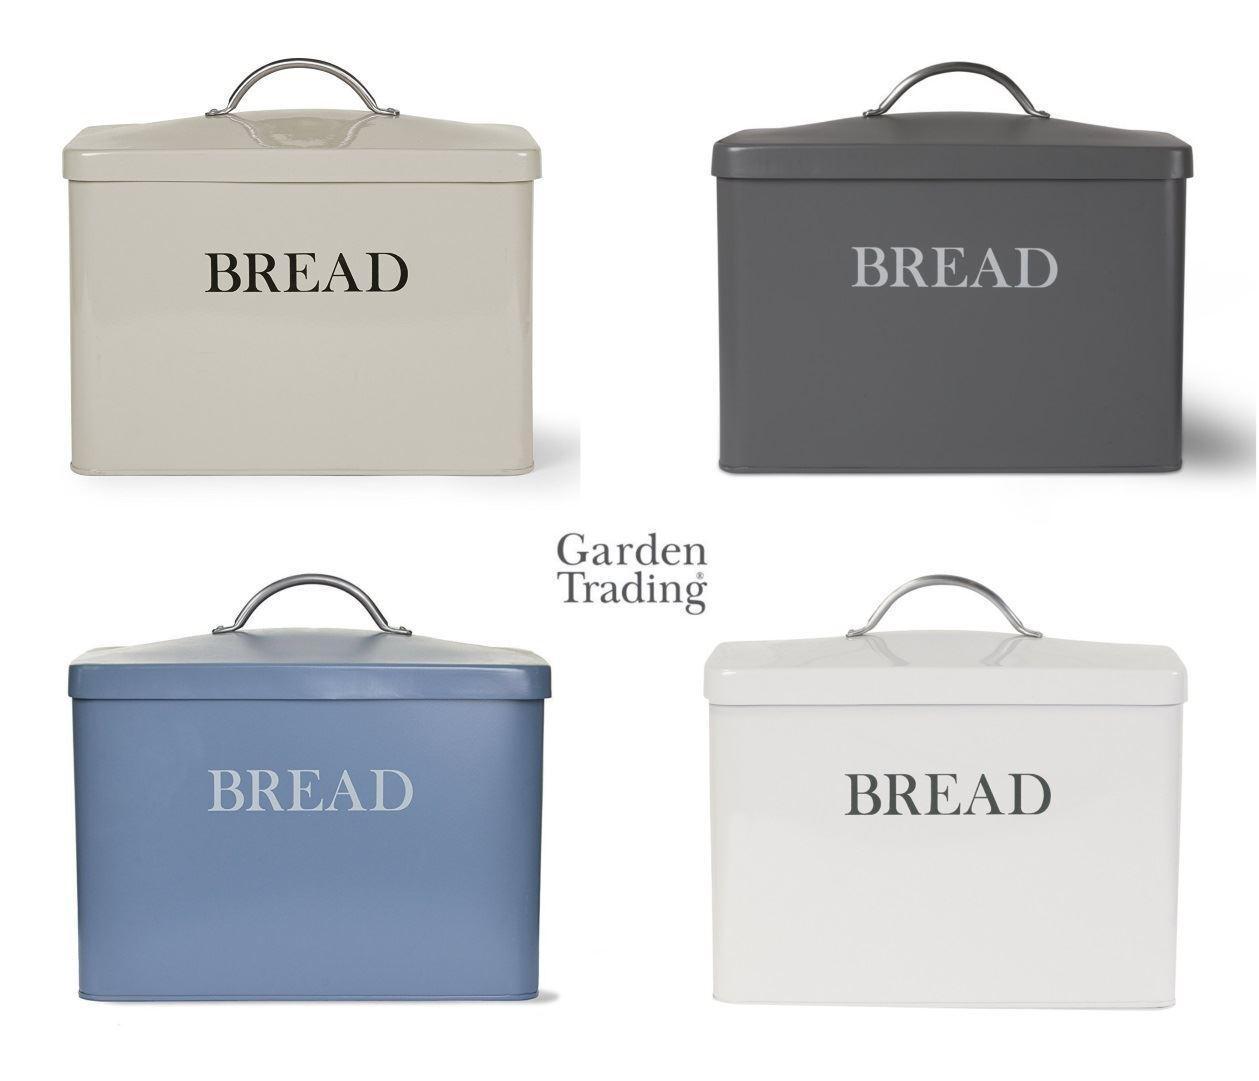 Garden Trading Retro Steel Large Bread Bin Storage Box bluee, Clay, Grey or Chalk